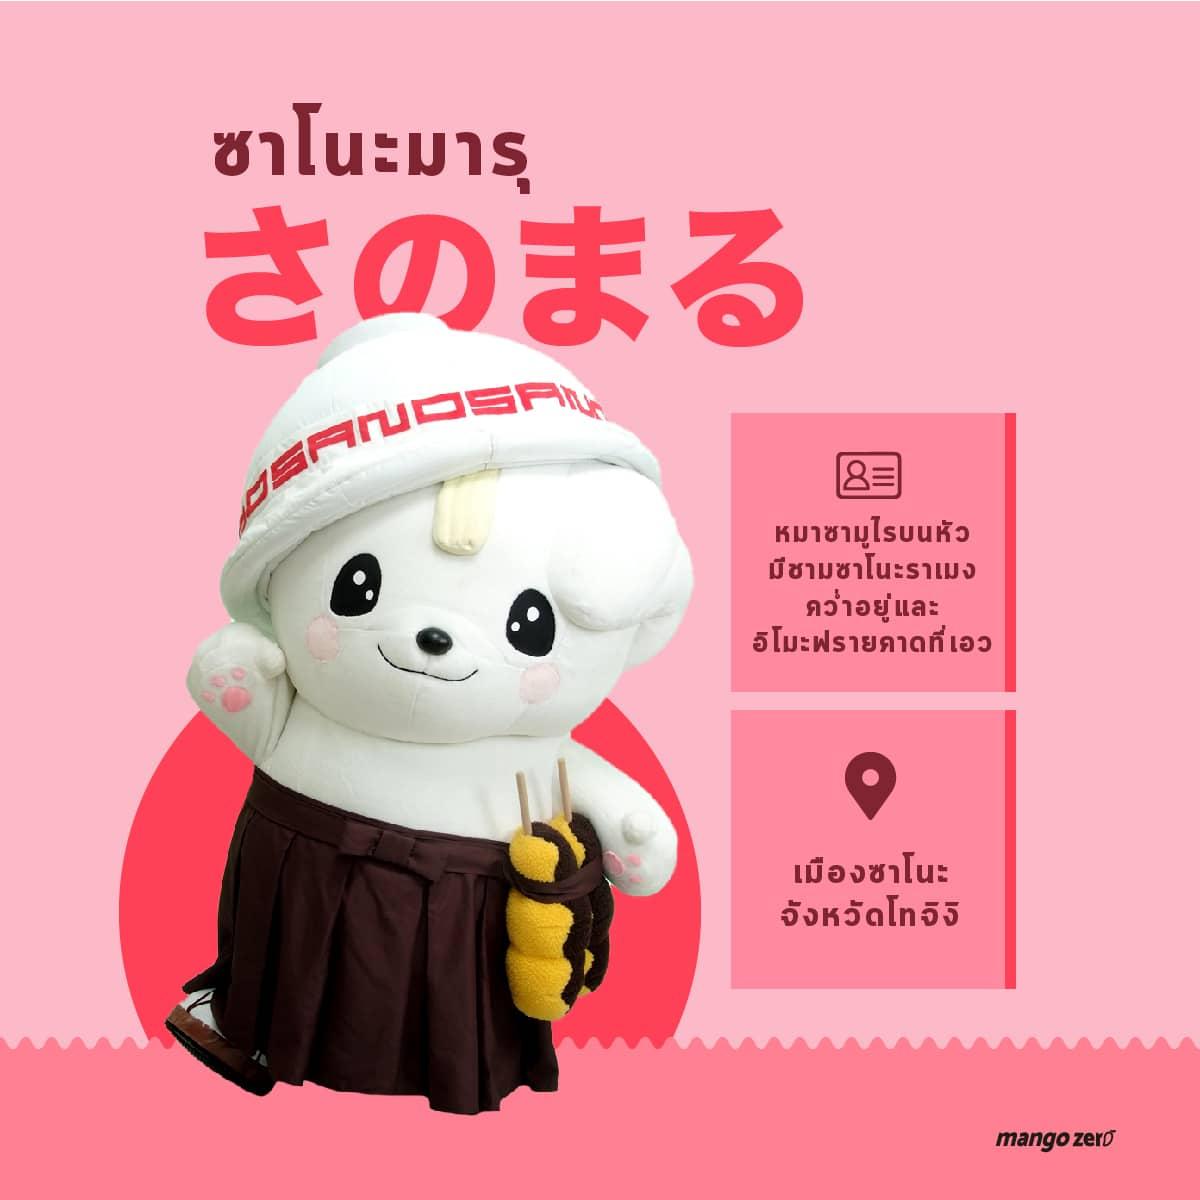 8-cute-mascots-in-japan-07-04